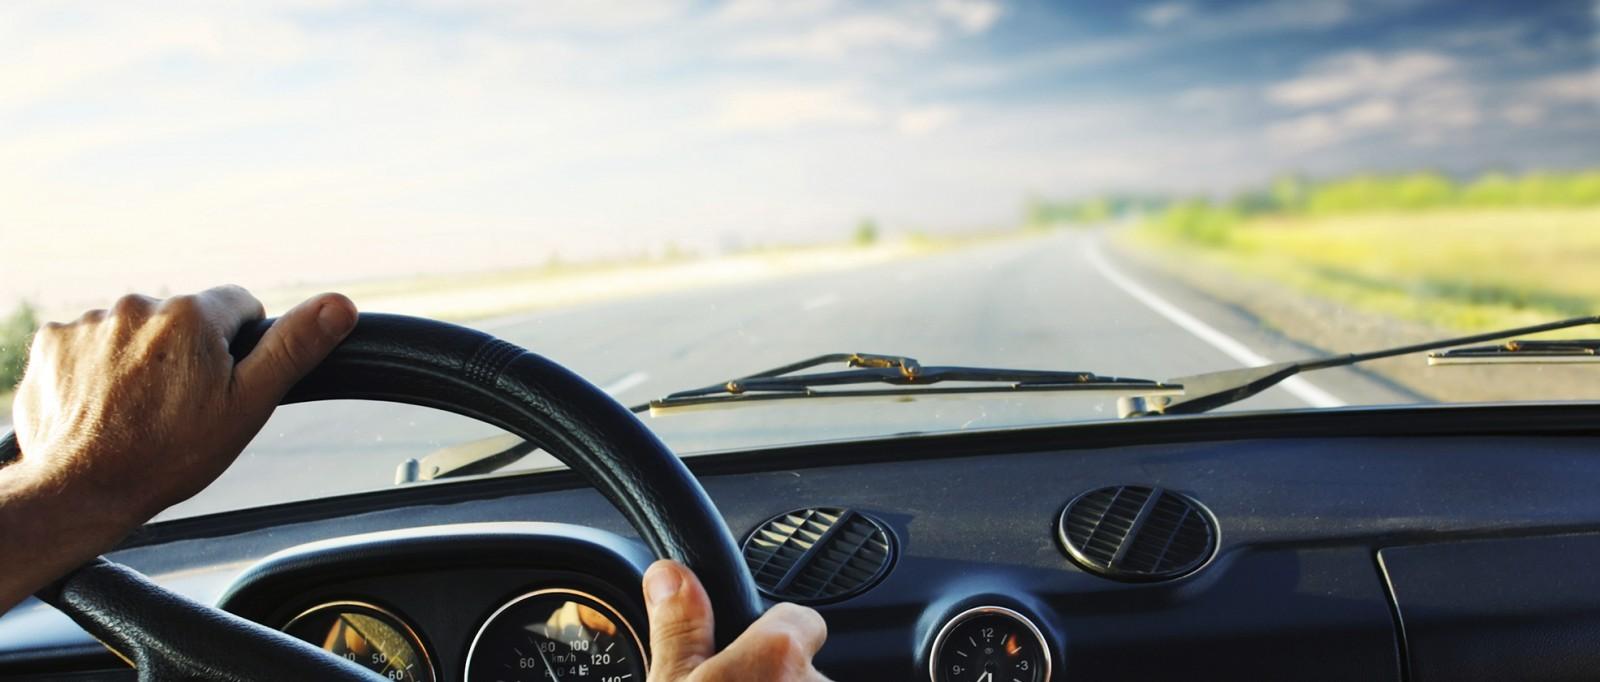 car-insurance-1600x682-BANNER1.jpg